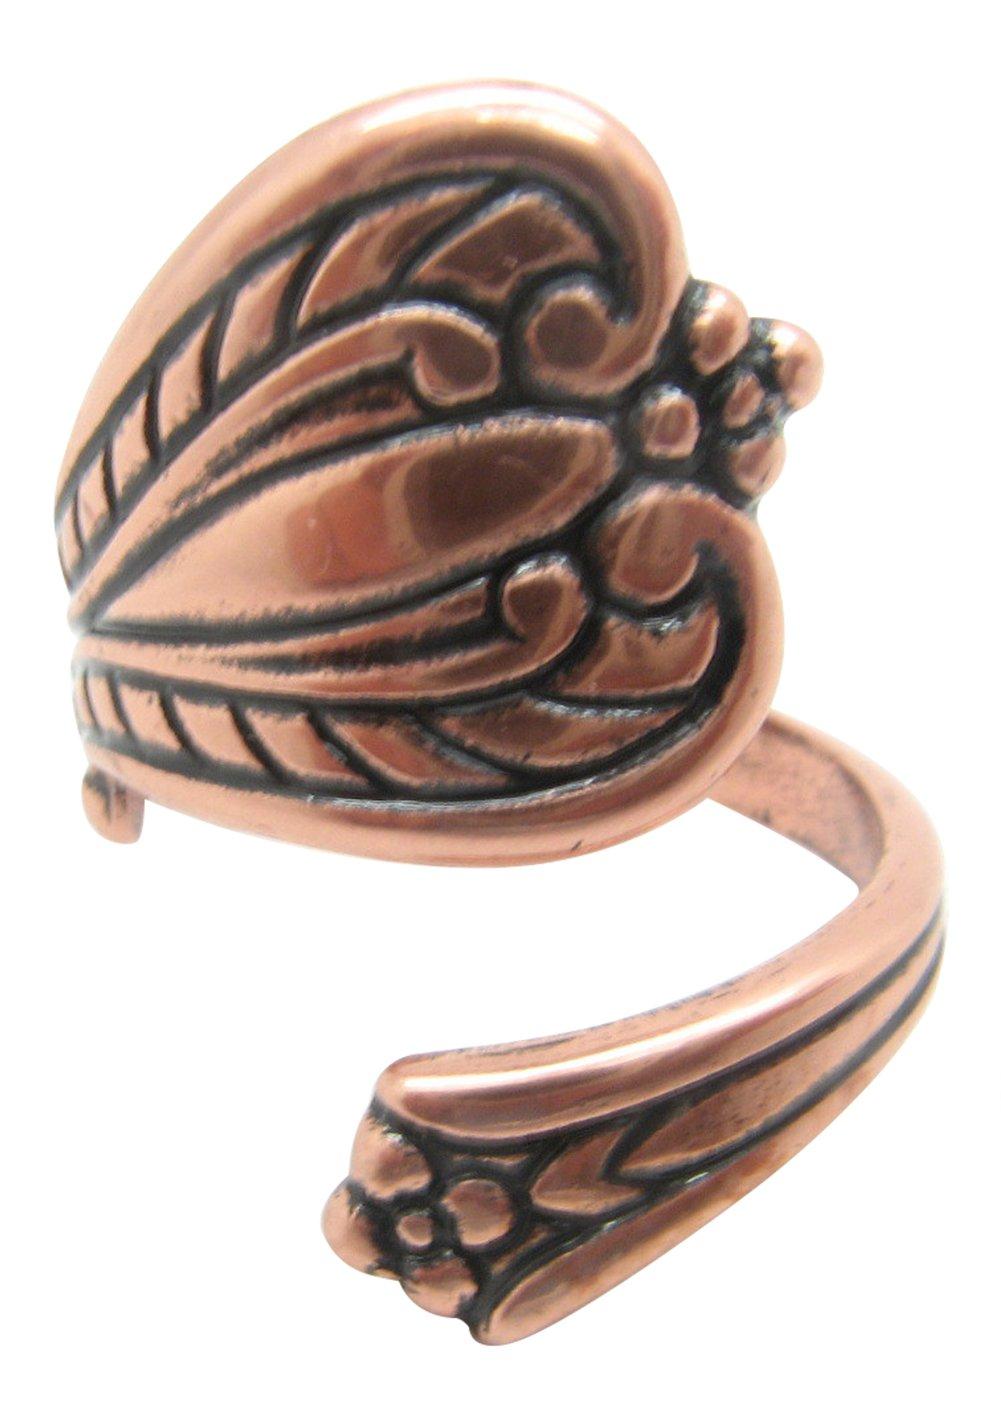 Adjustable Copper Ring #1795C2